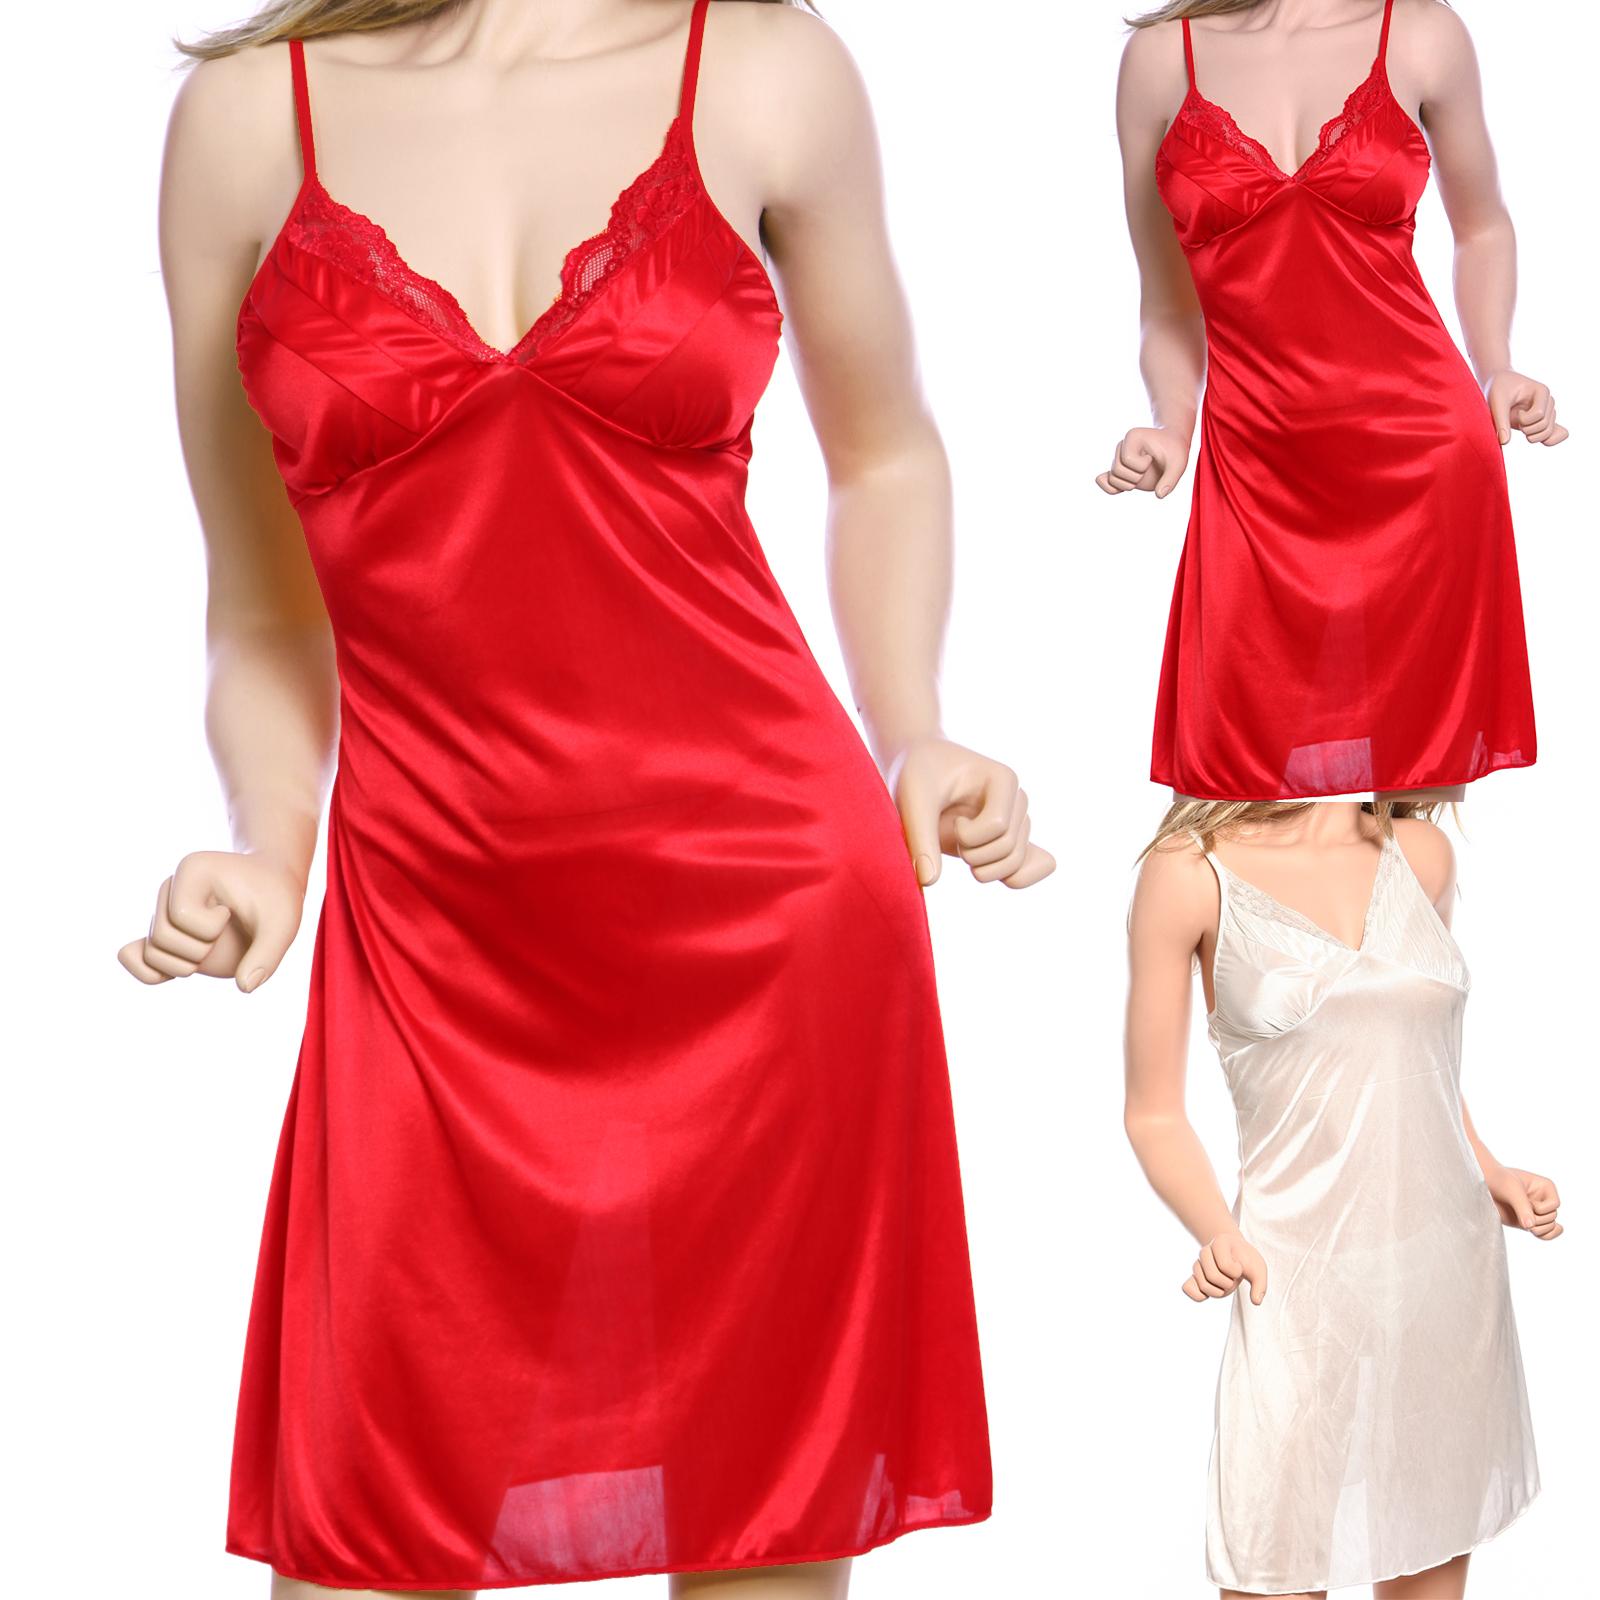 Vintage Satin lace trim Chemise Nightdress Full Slip Dress ...